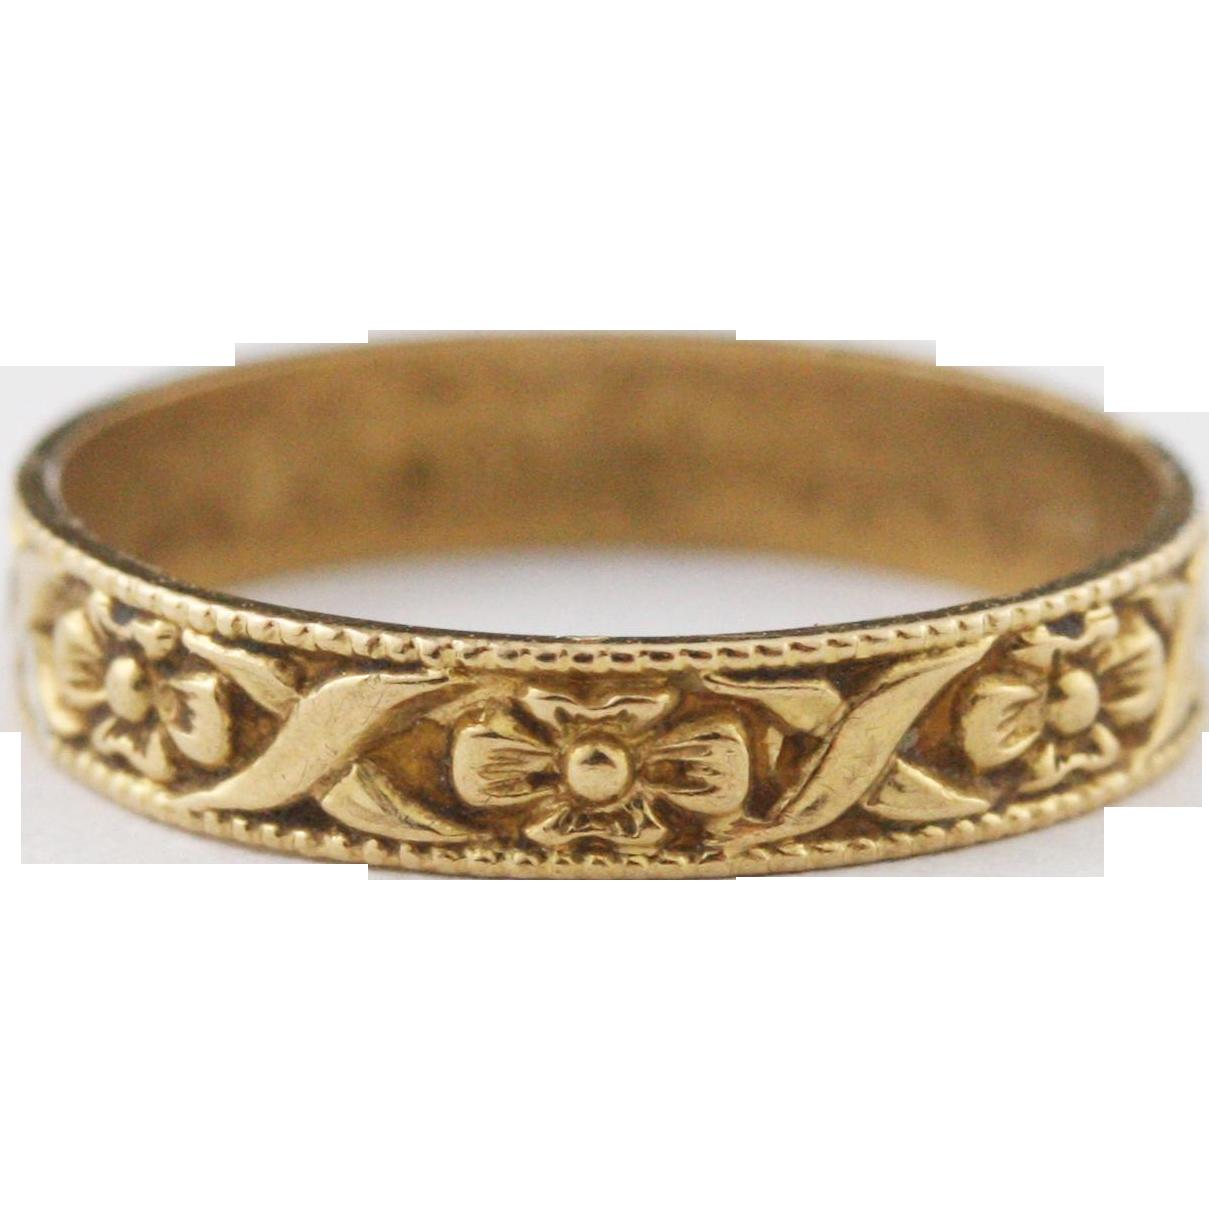 deco antique 10k gold baby ring engraved floral